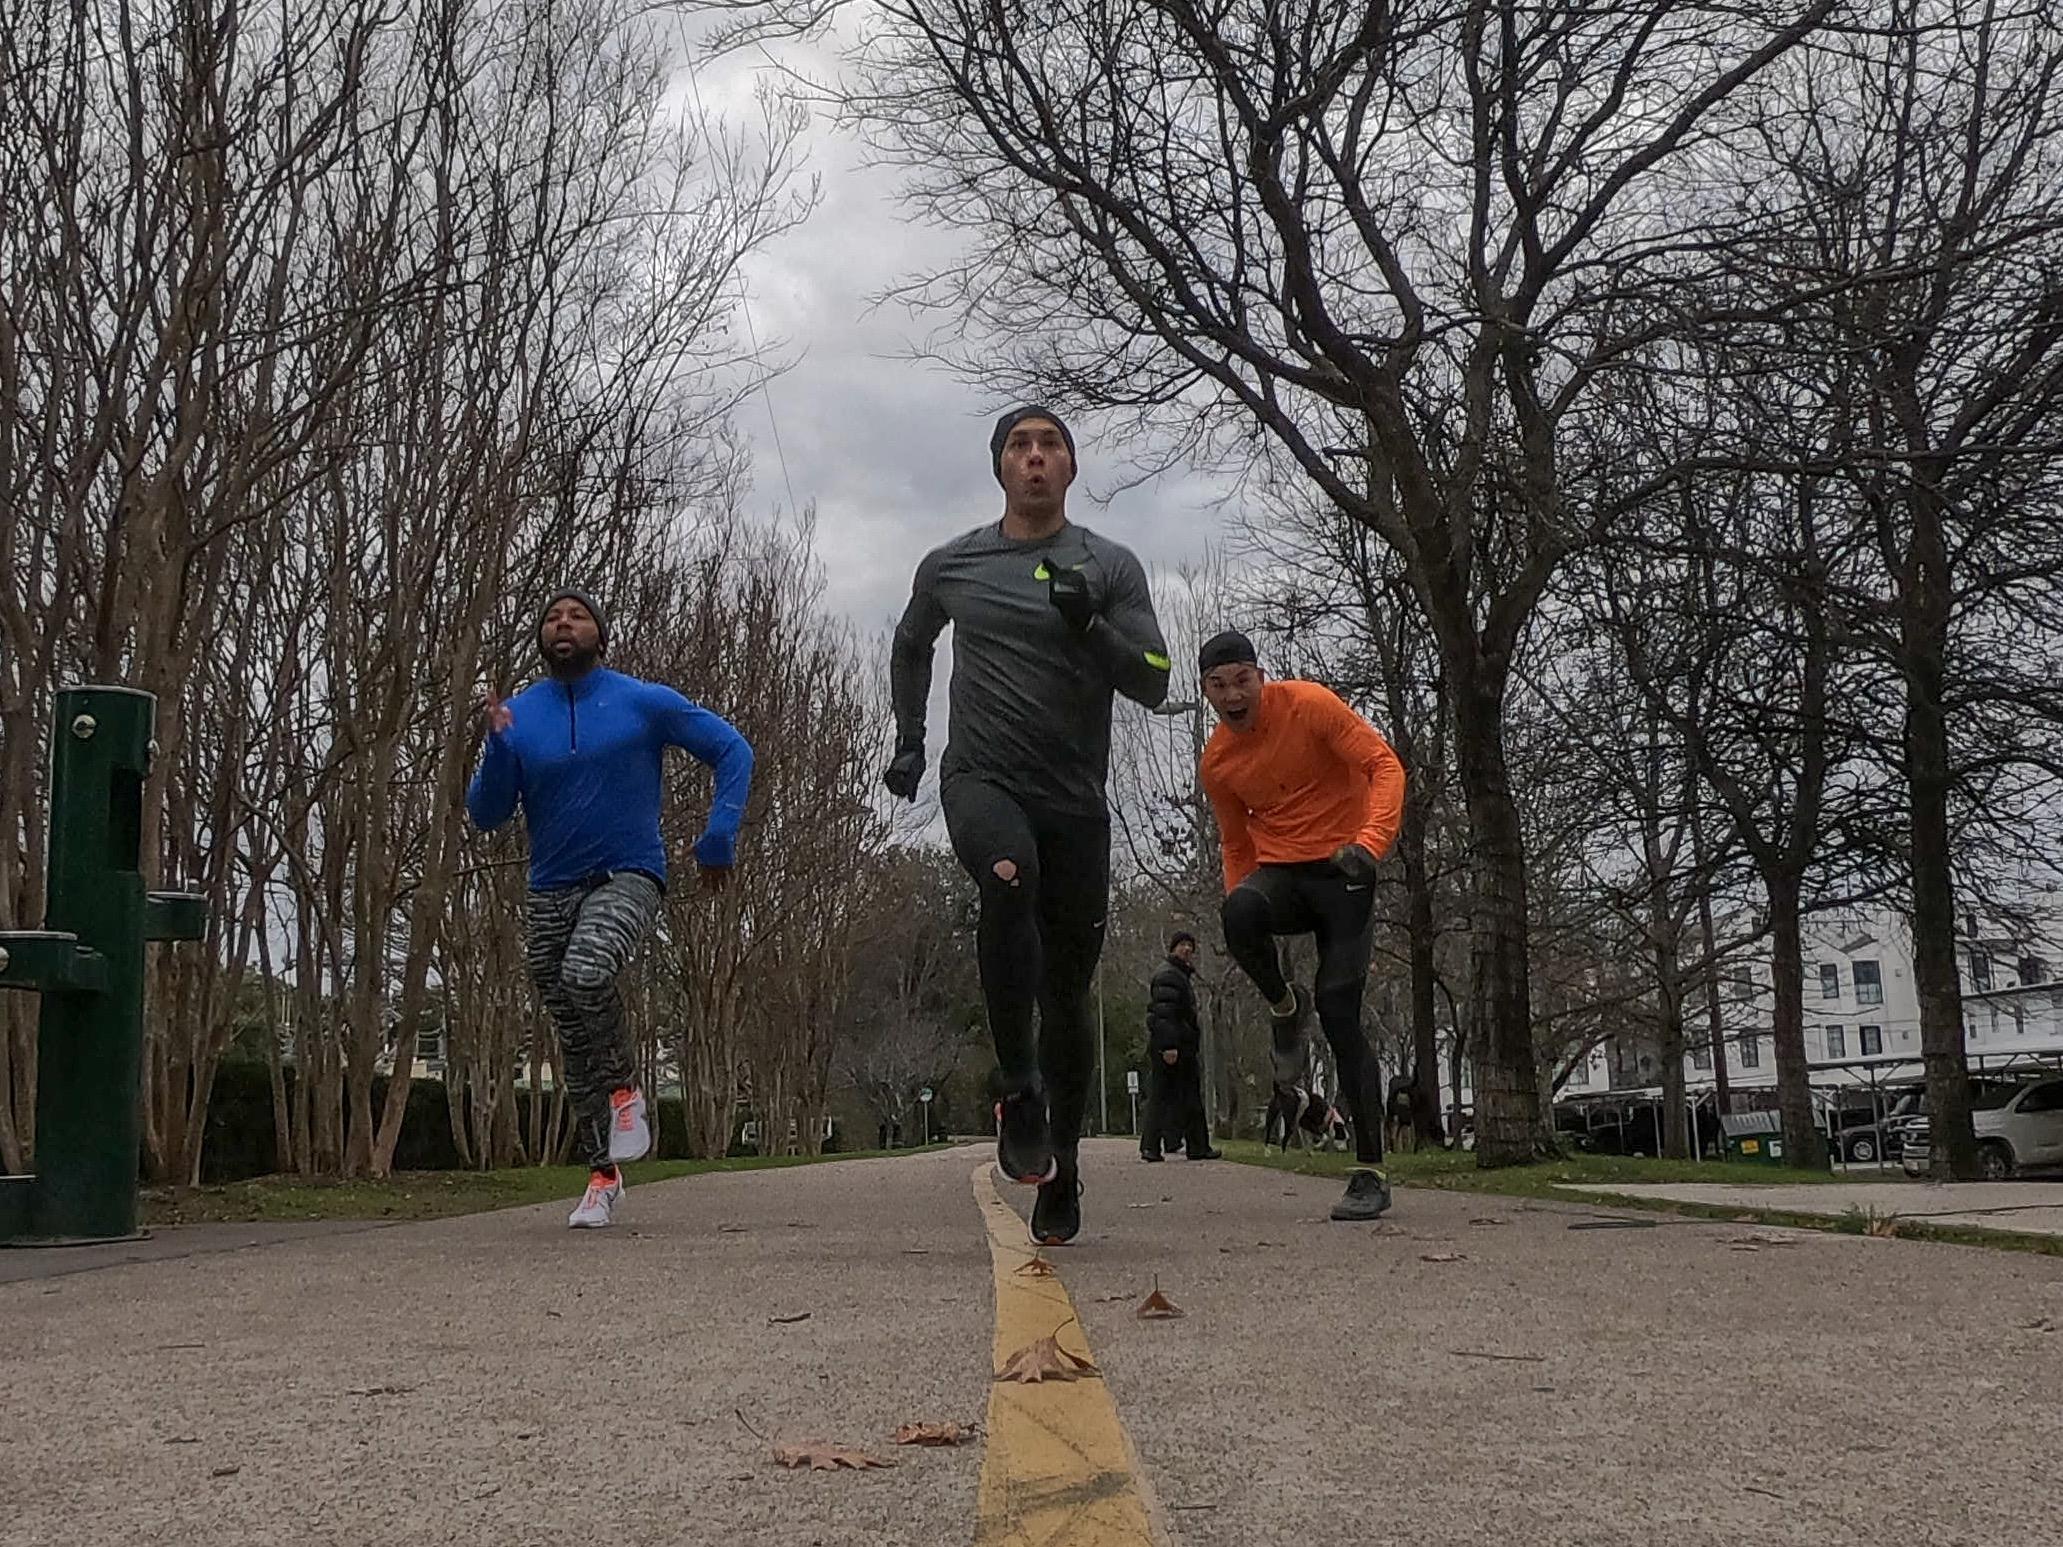 Marathon Squad at Katy Trail in uptown Dallas